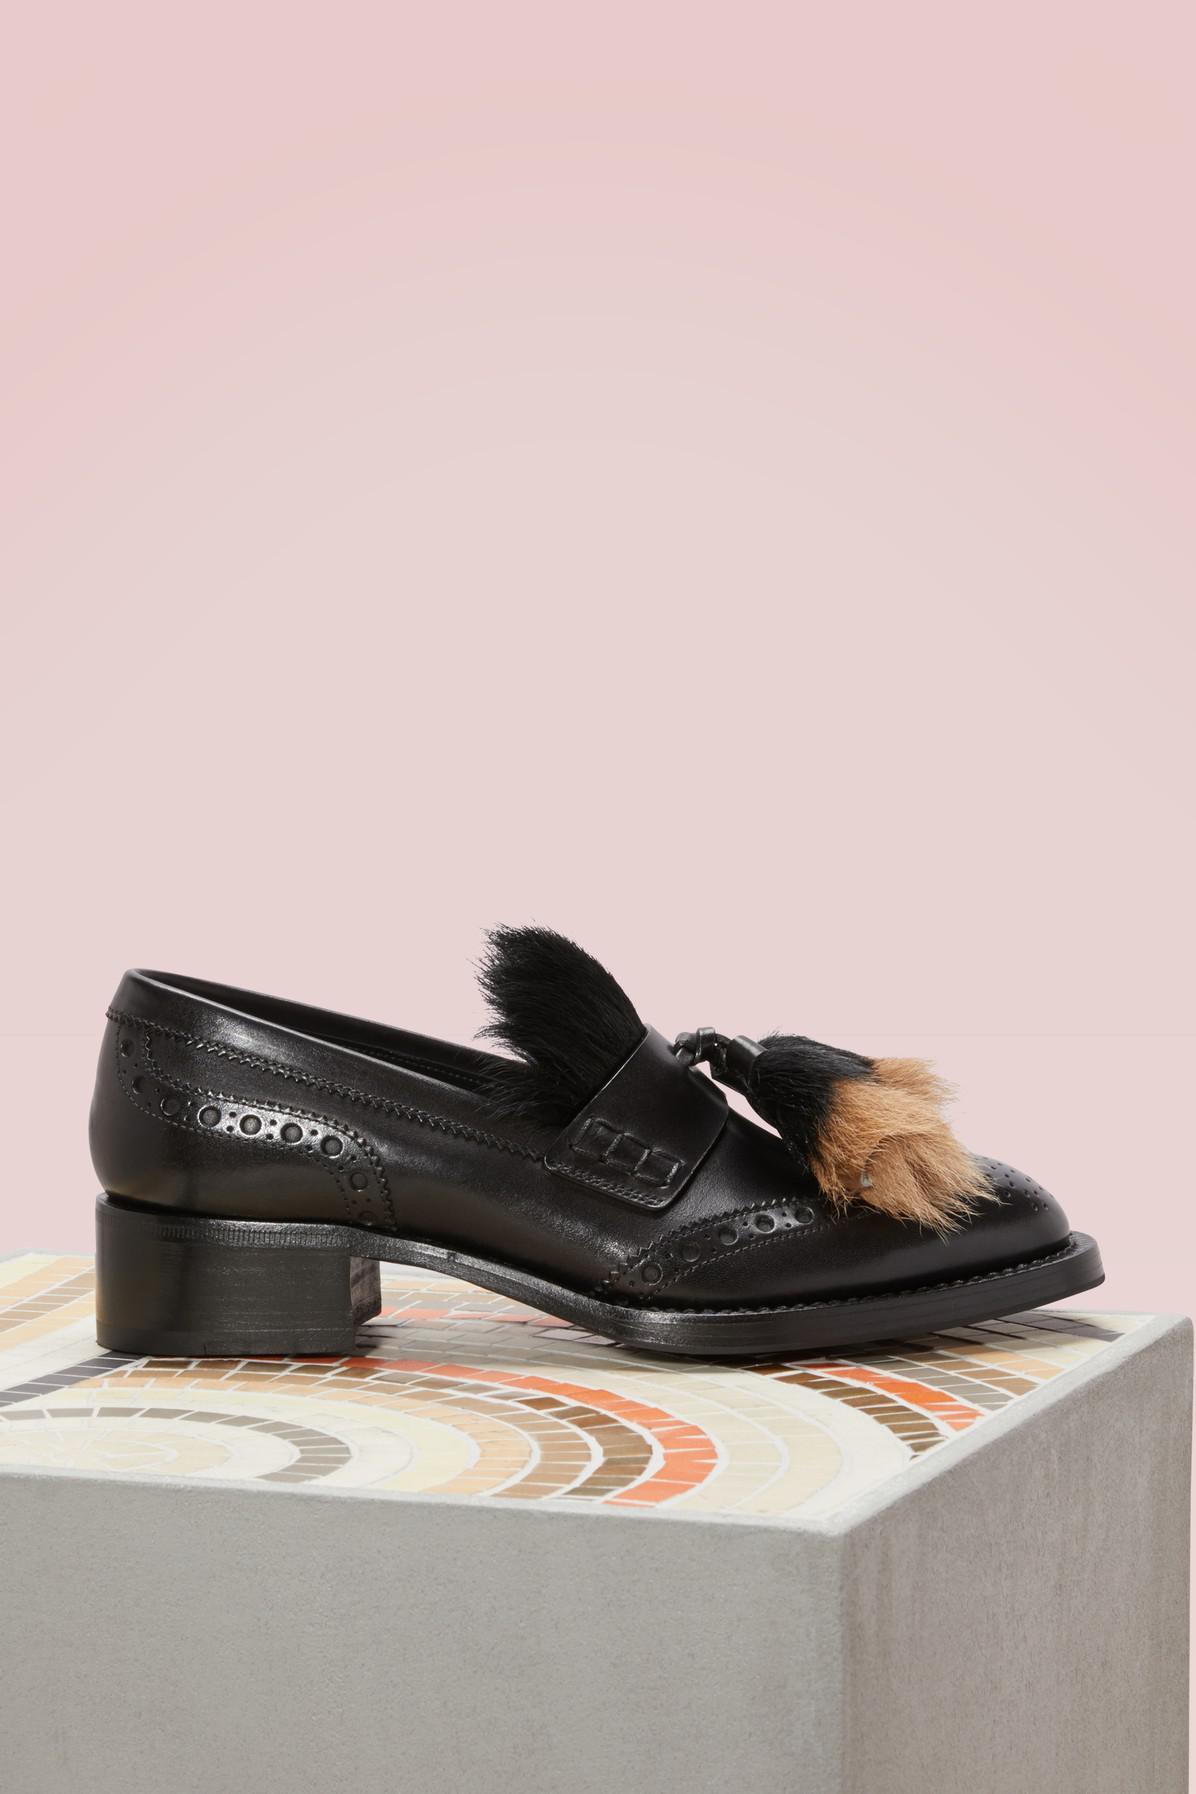 Cheap Sale Pictures Buy Cheap Amazing Price Prada Pony fur loafers Nice uQYdz6tJr6